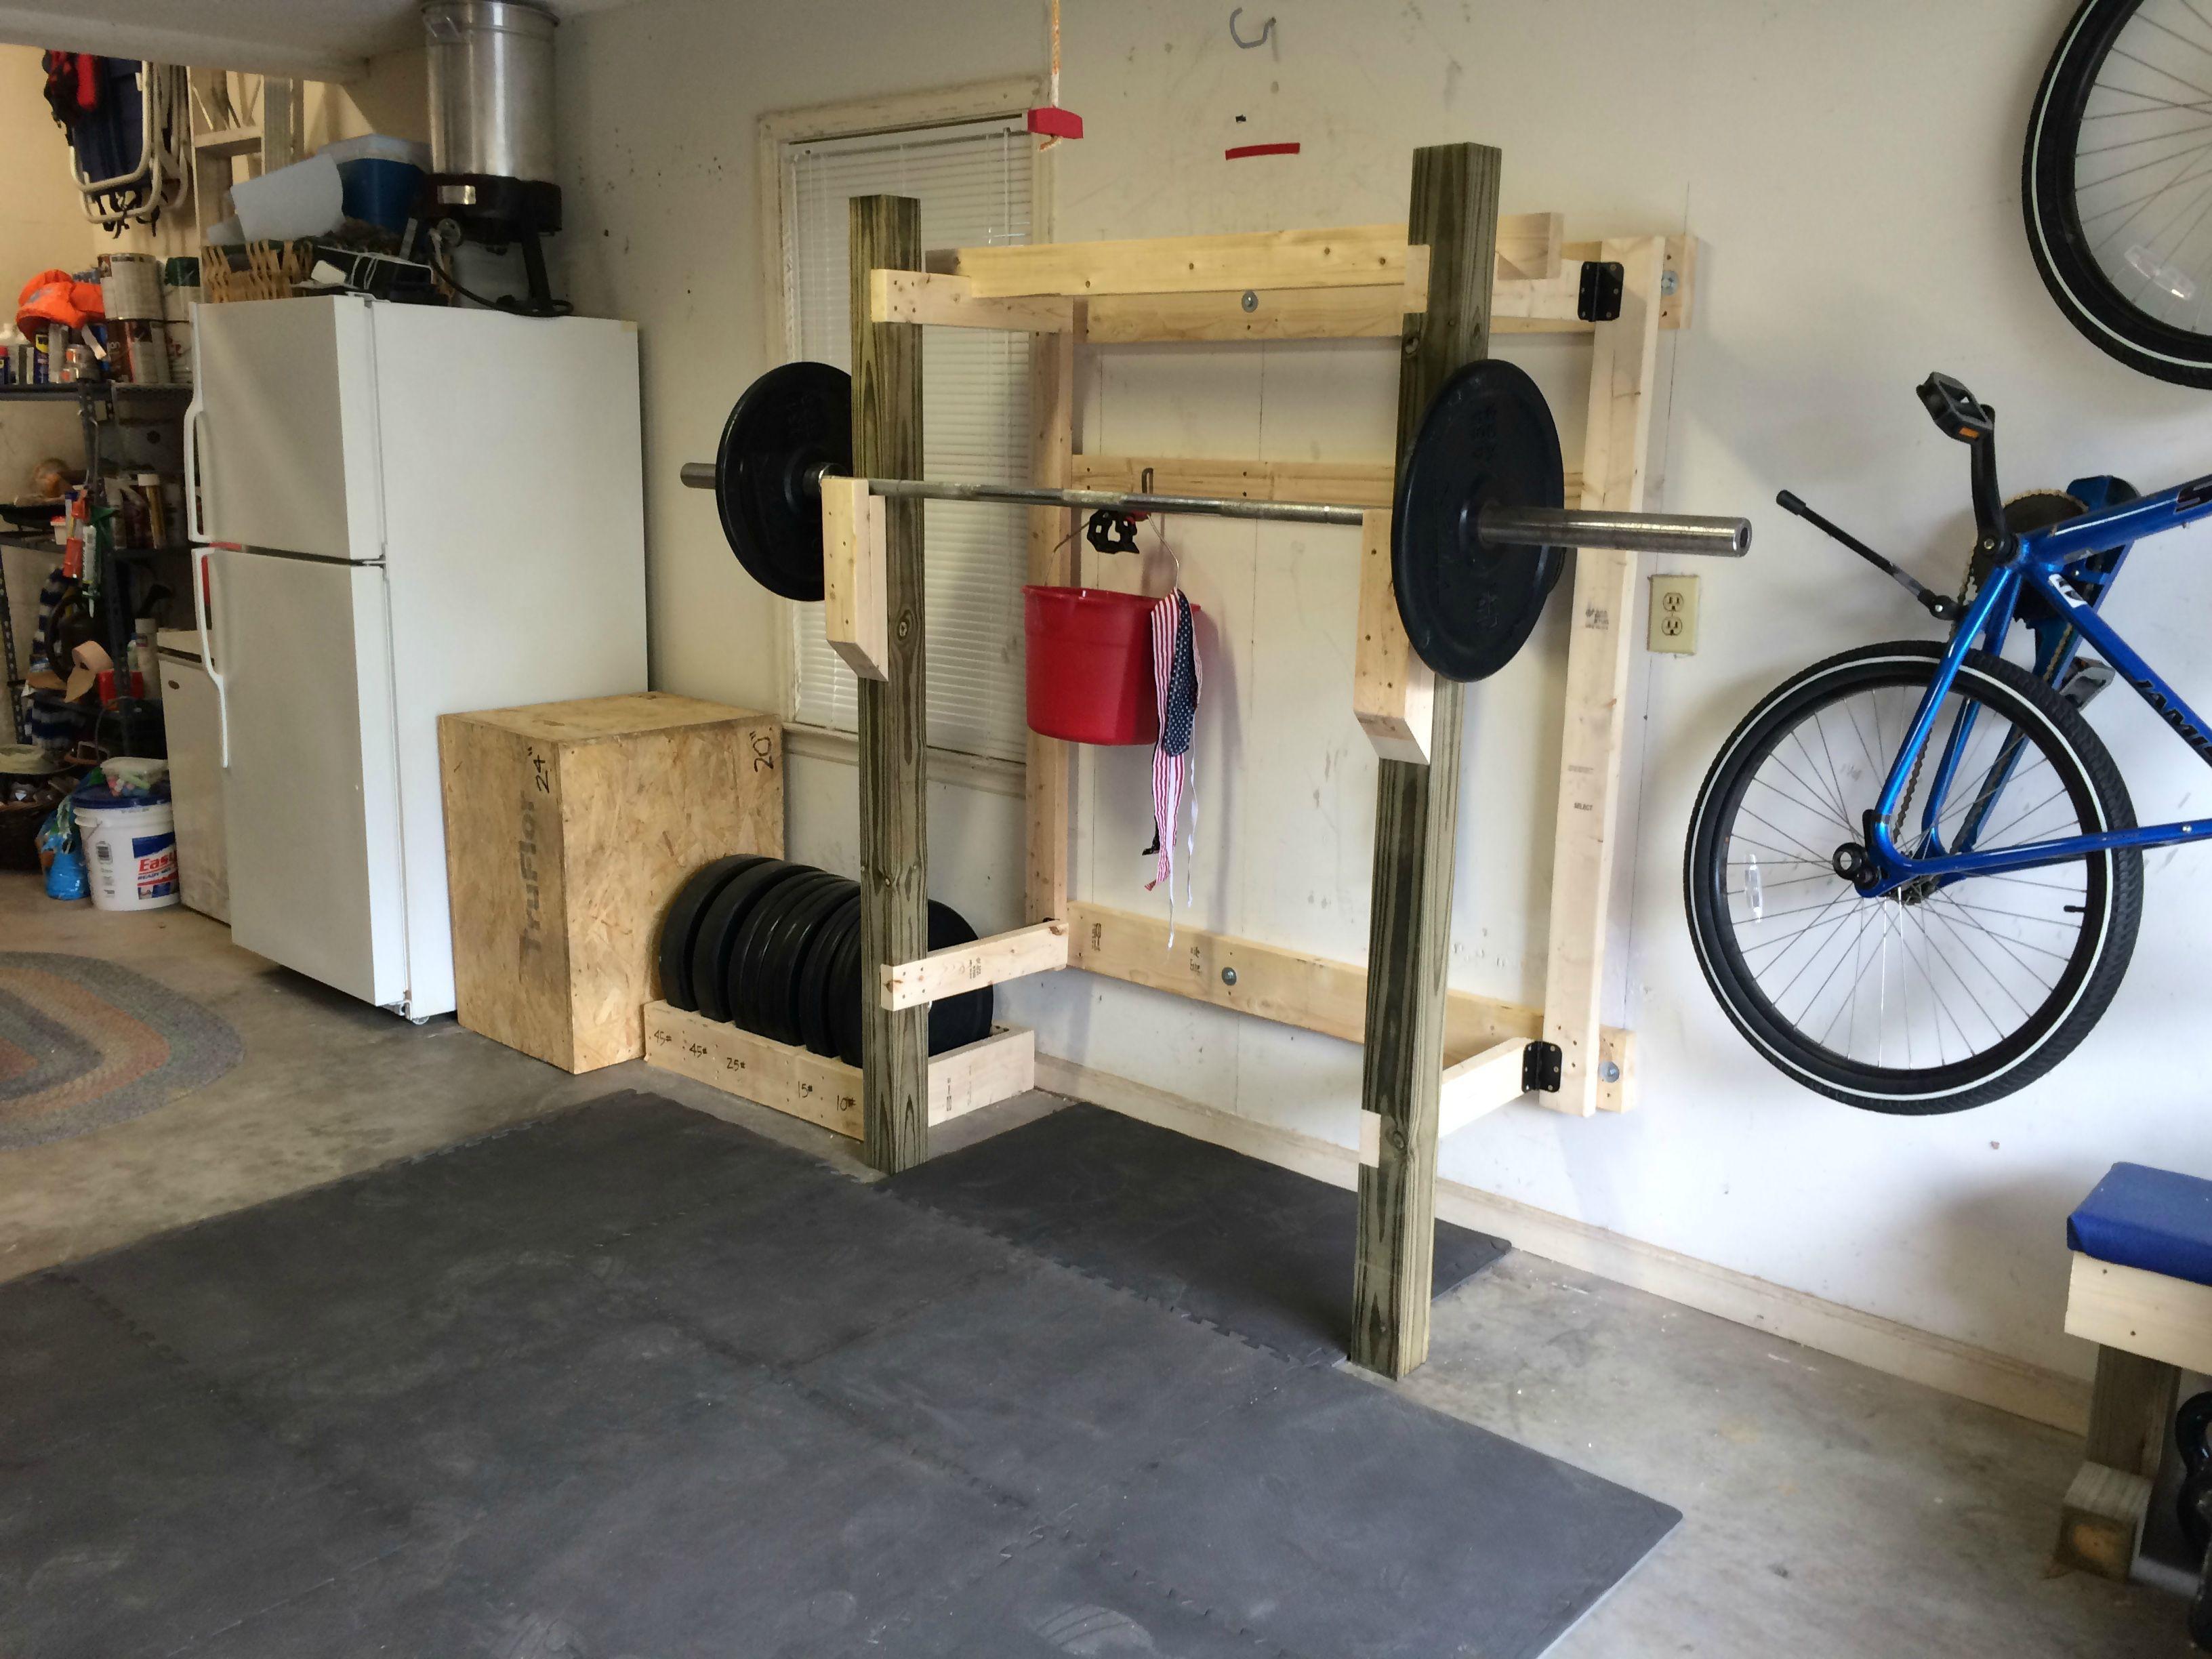 diy squat rack Google Search Diy home gym, Home gym